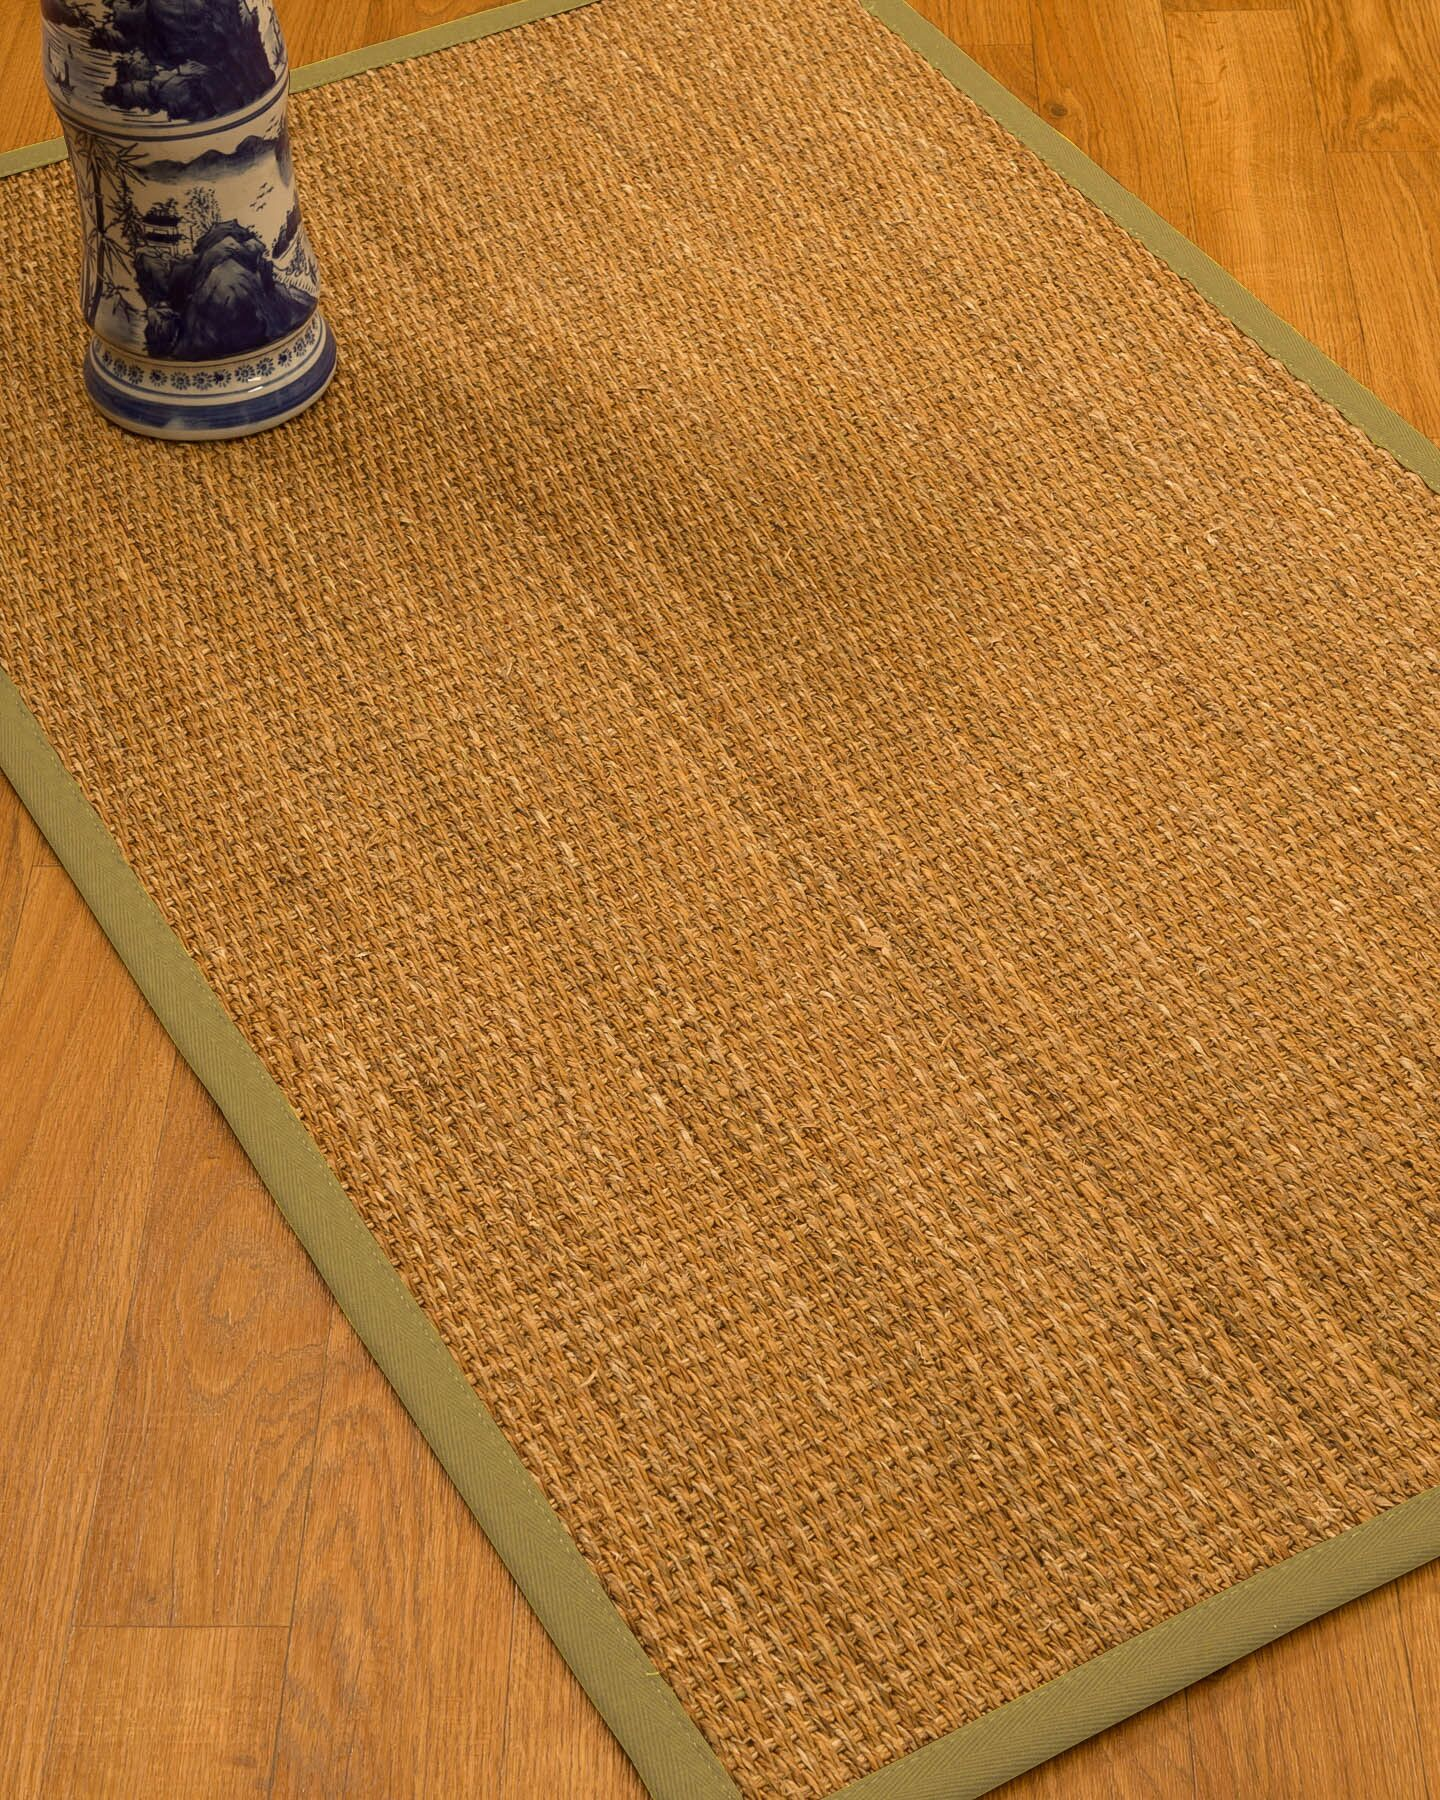 Kimberwood Border Hand-Woven Brown/Natural Area Rug Rug Size: Rectangle 6' x 9', Rug Pad Included: Yes